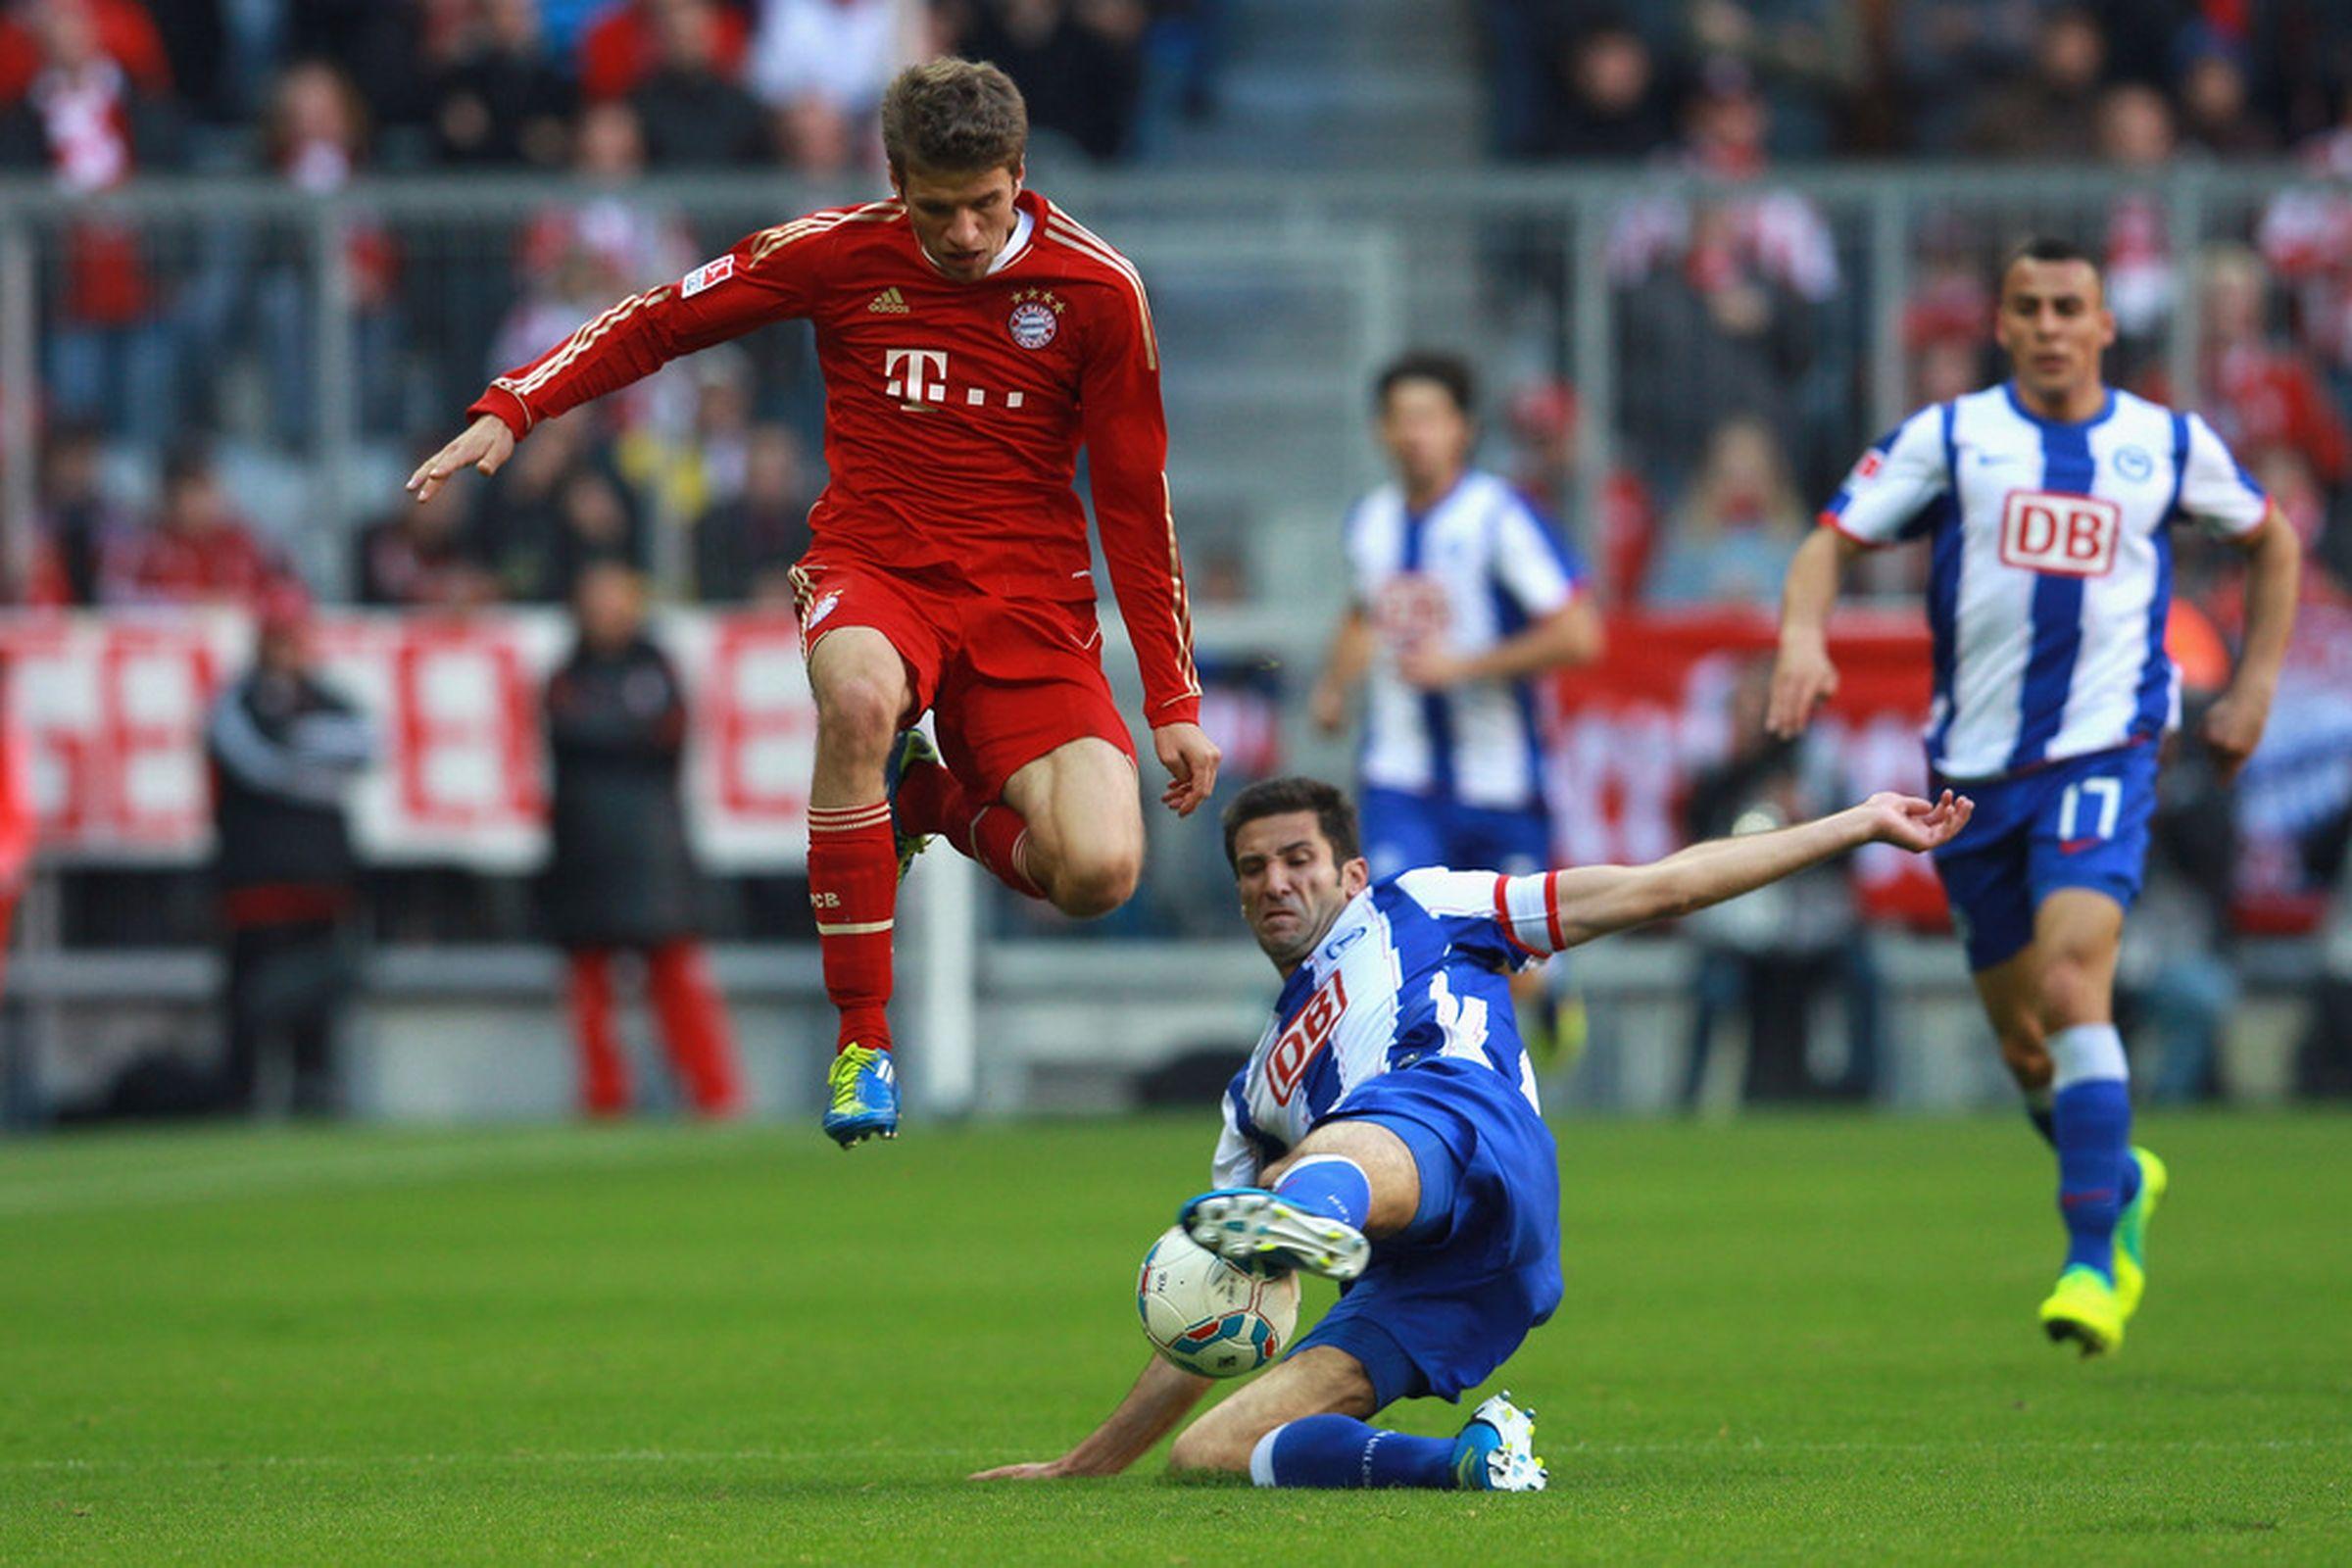 Ponturi pariuri – Bayern Munchen vs Hertha Berlin – Bundesliga